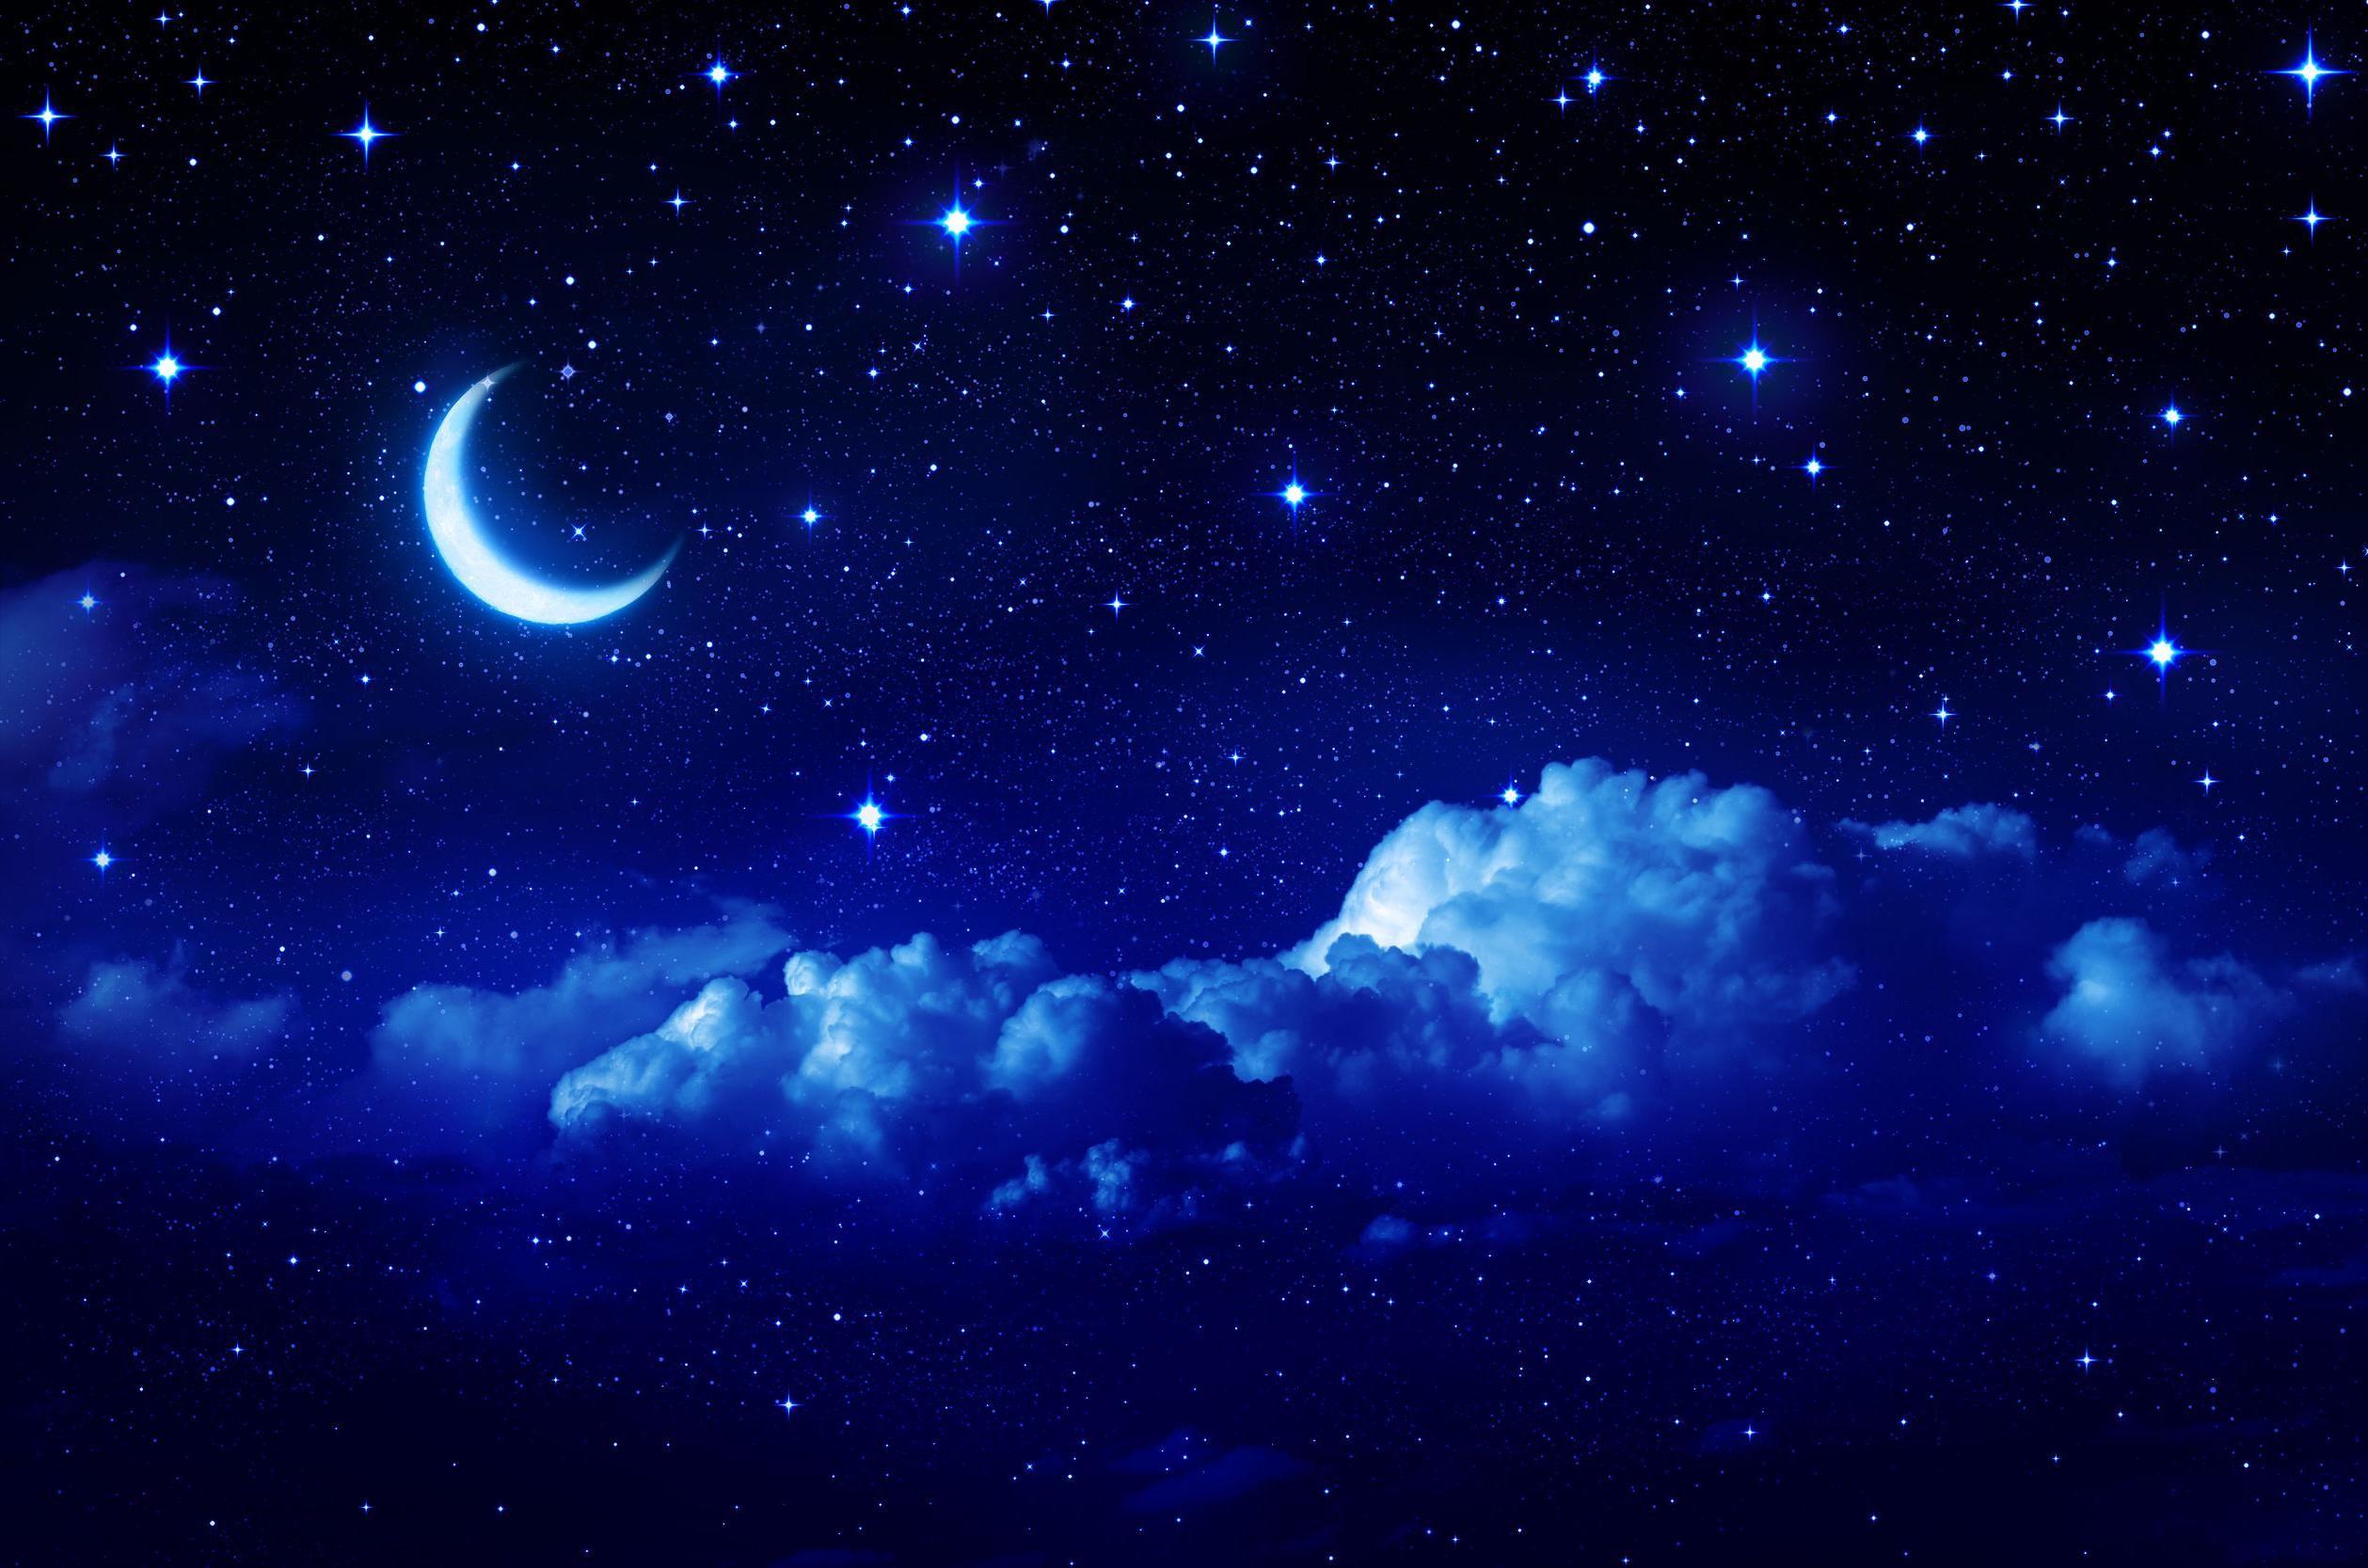 blue night sky background - photo #9